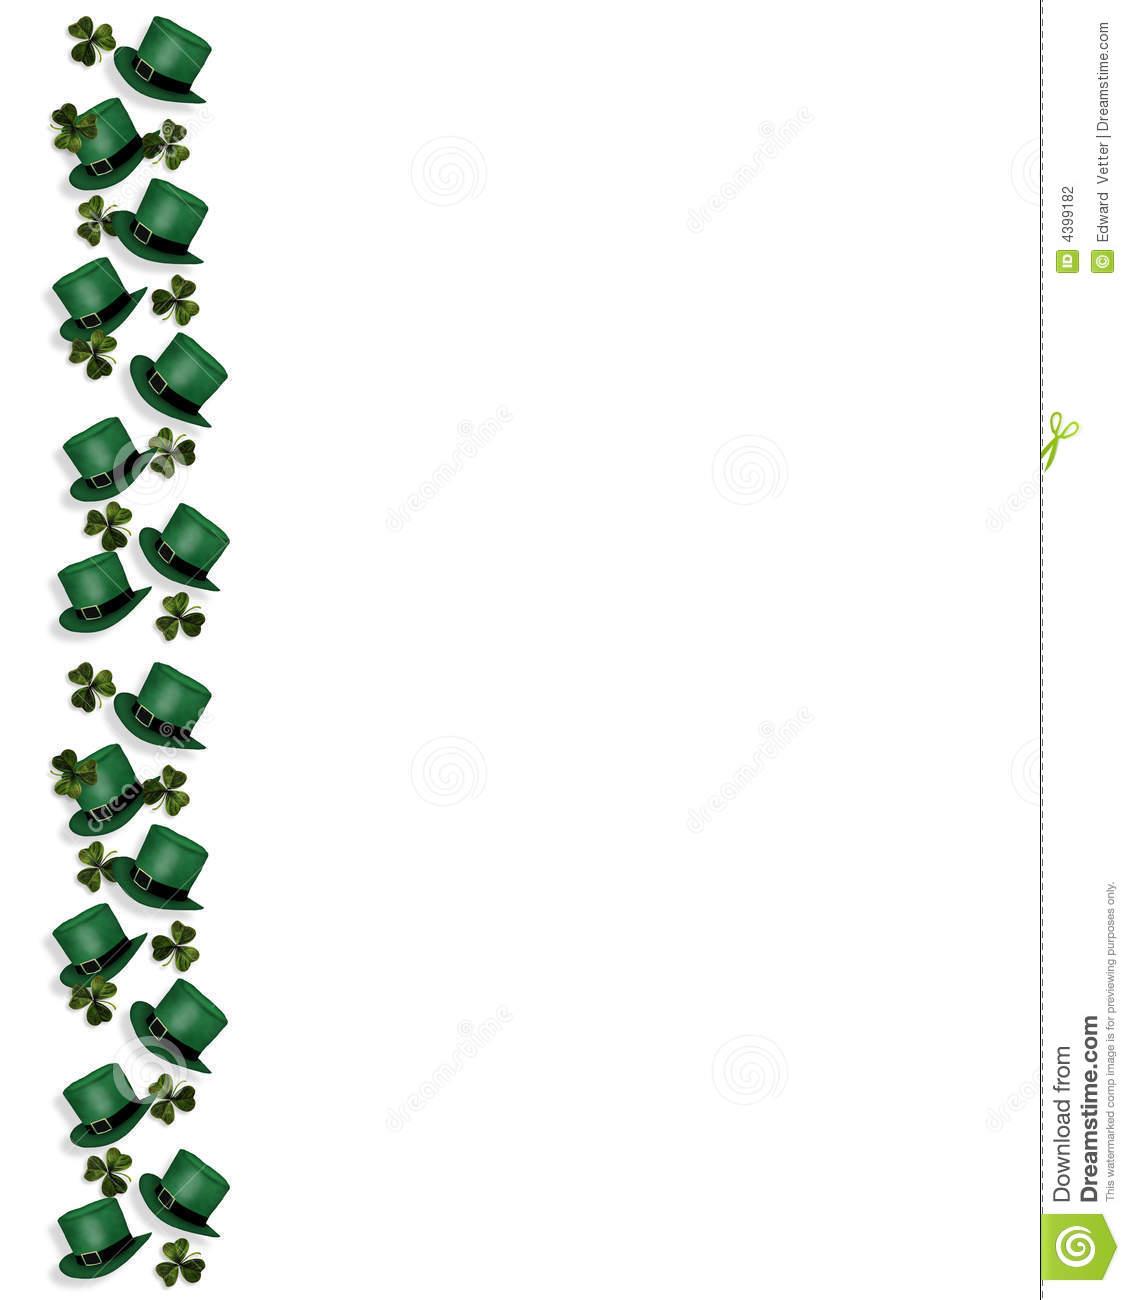 1130x1300 St. Patrick's Day Clipart St Patrick's Day Border Clipart